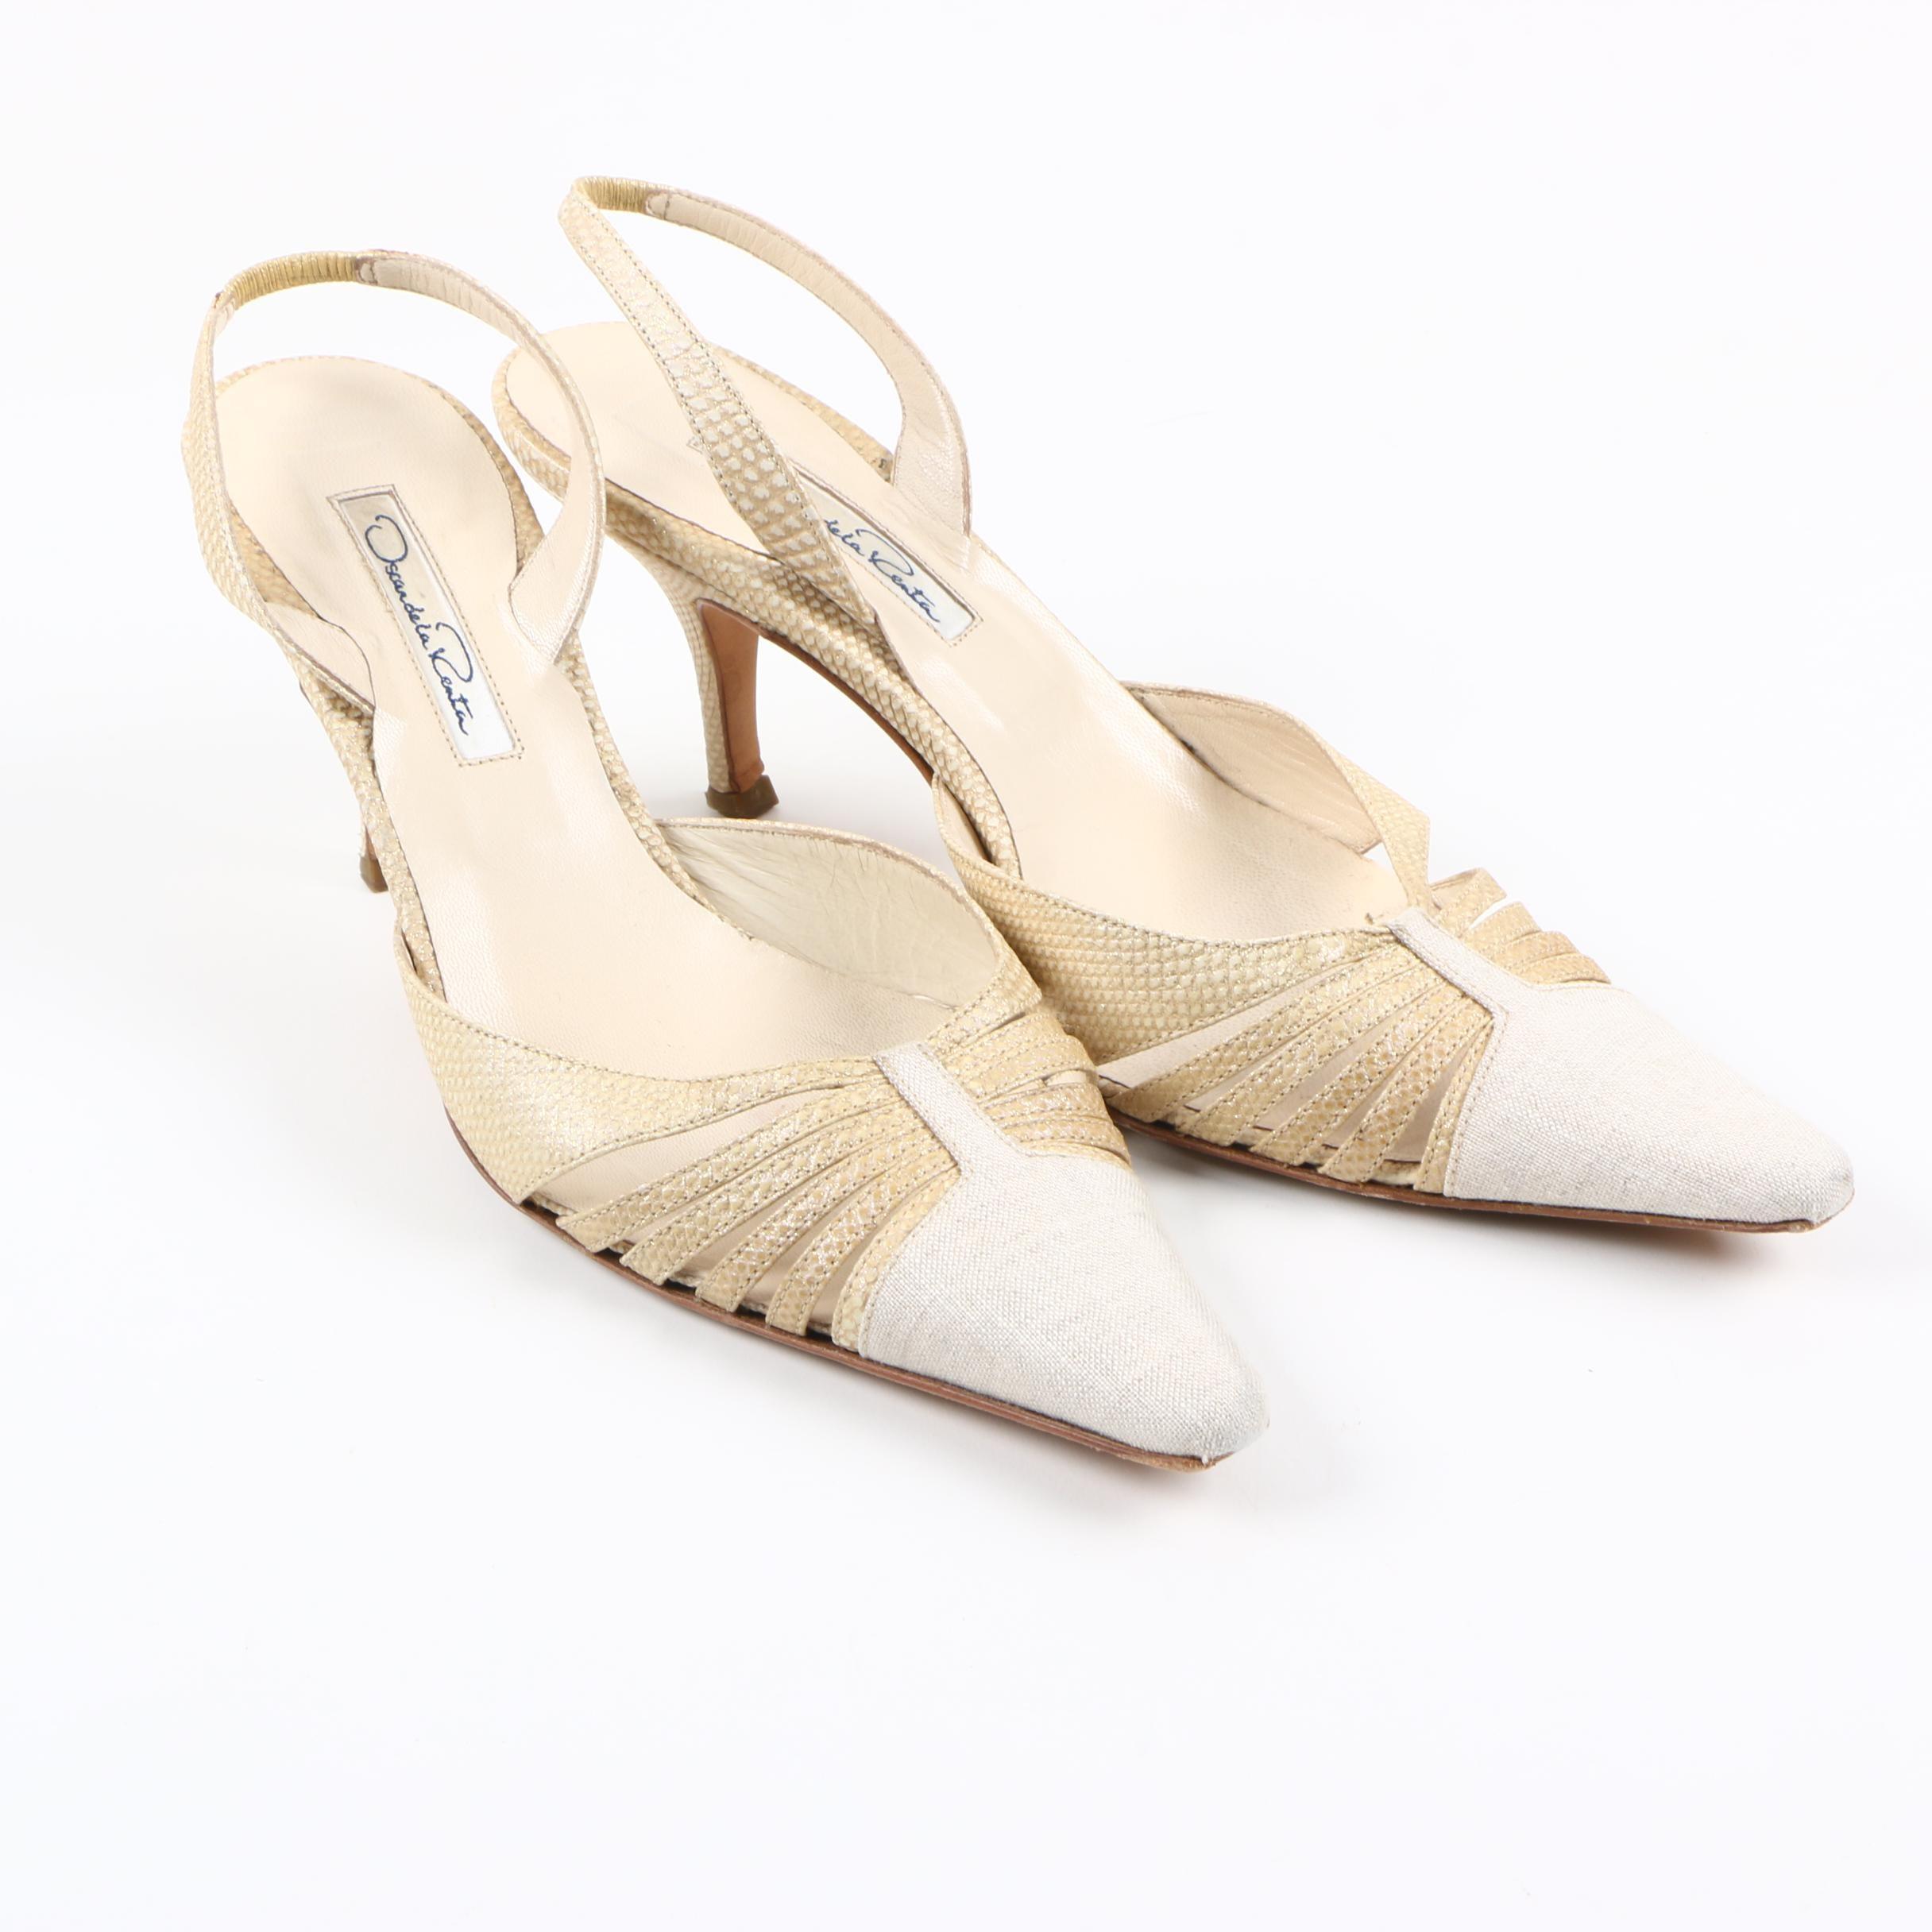 Oscar de la Renta Canvas and Leather Sling Back Heels